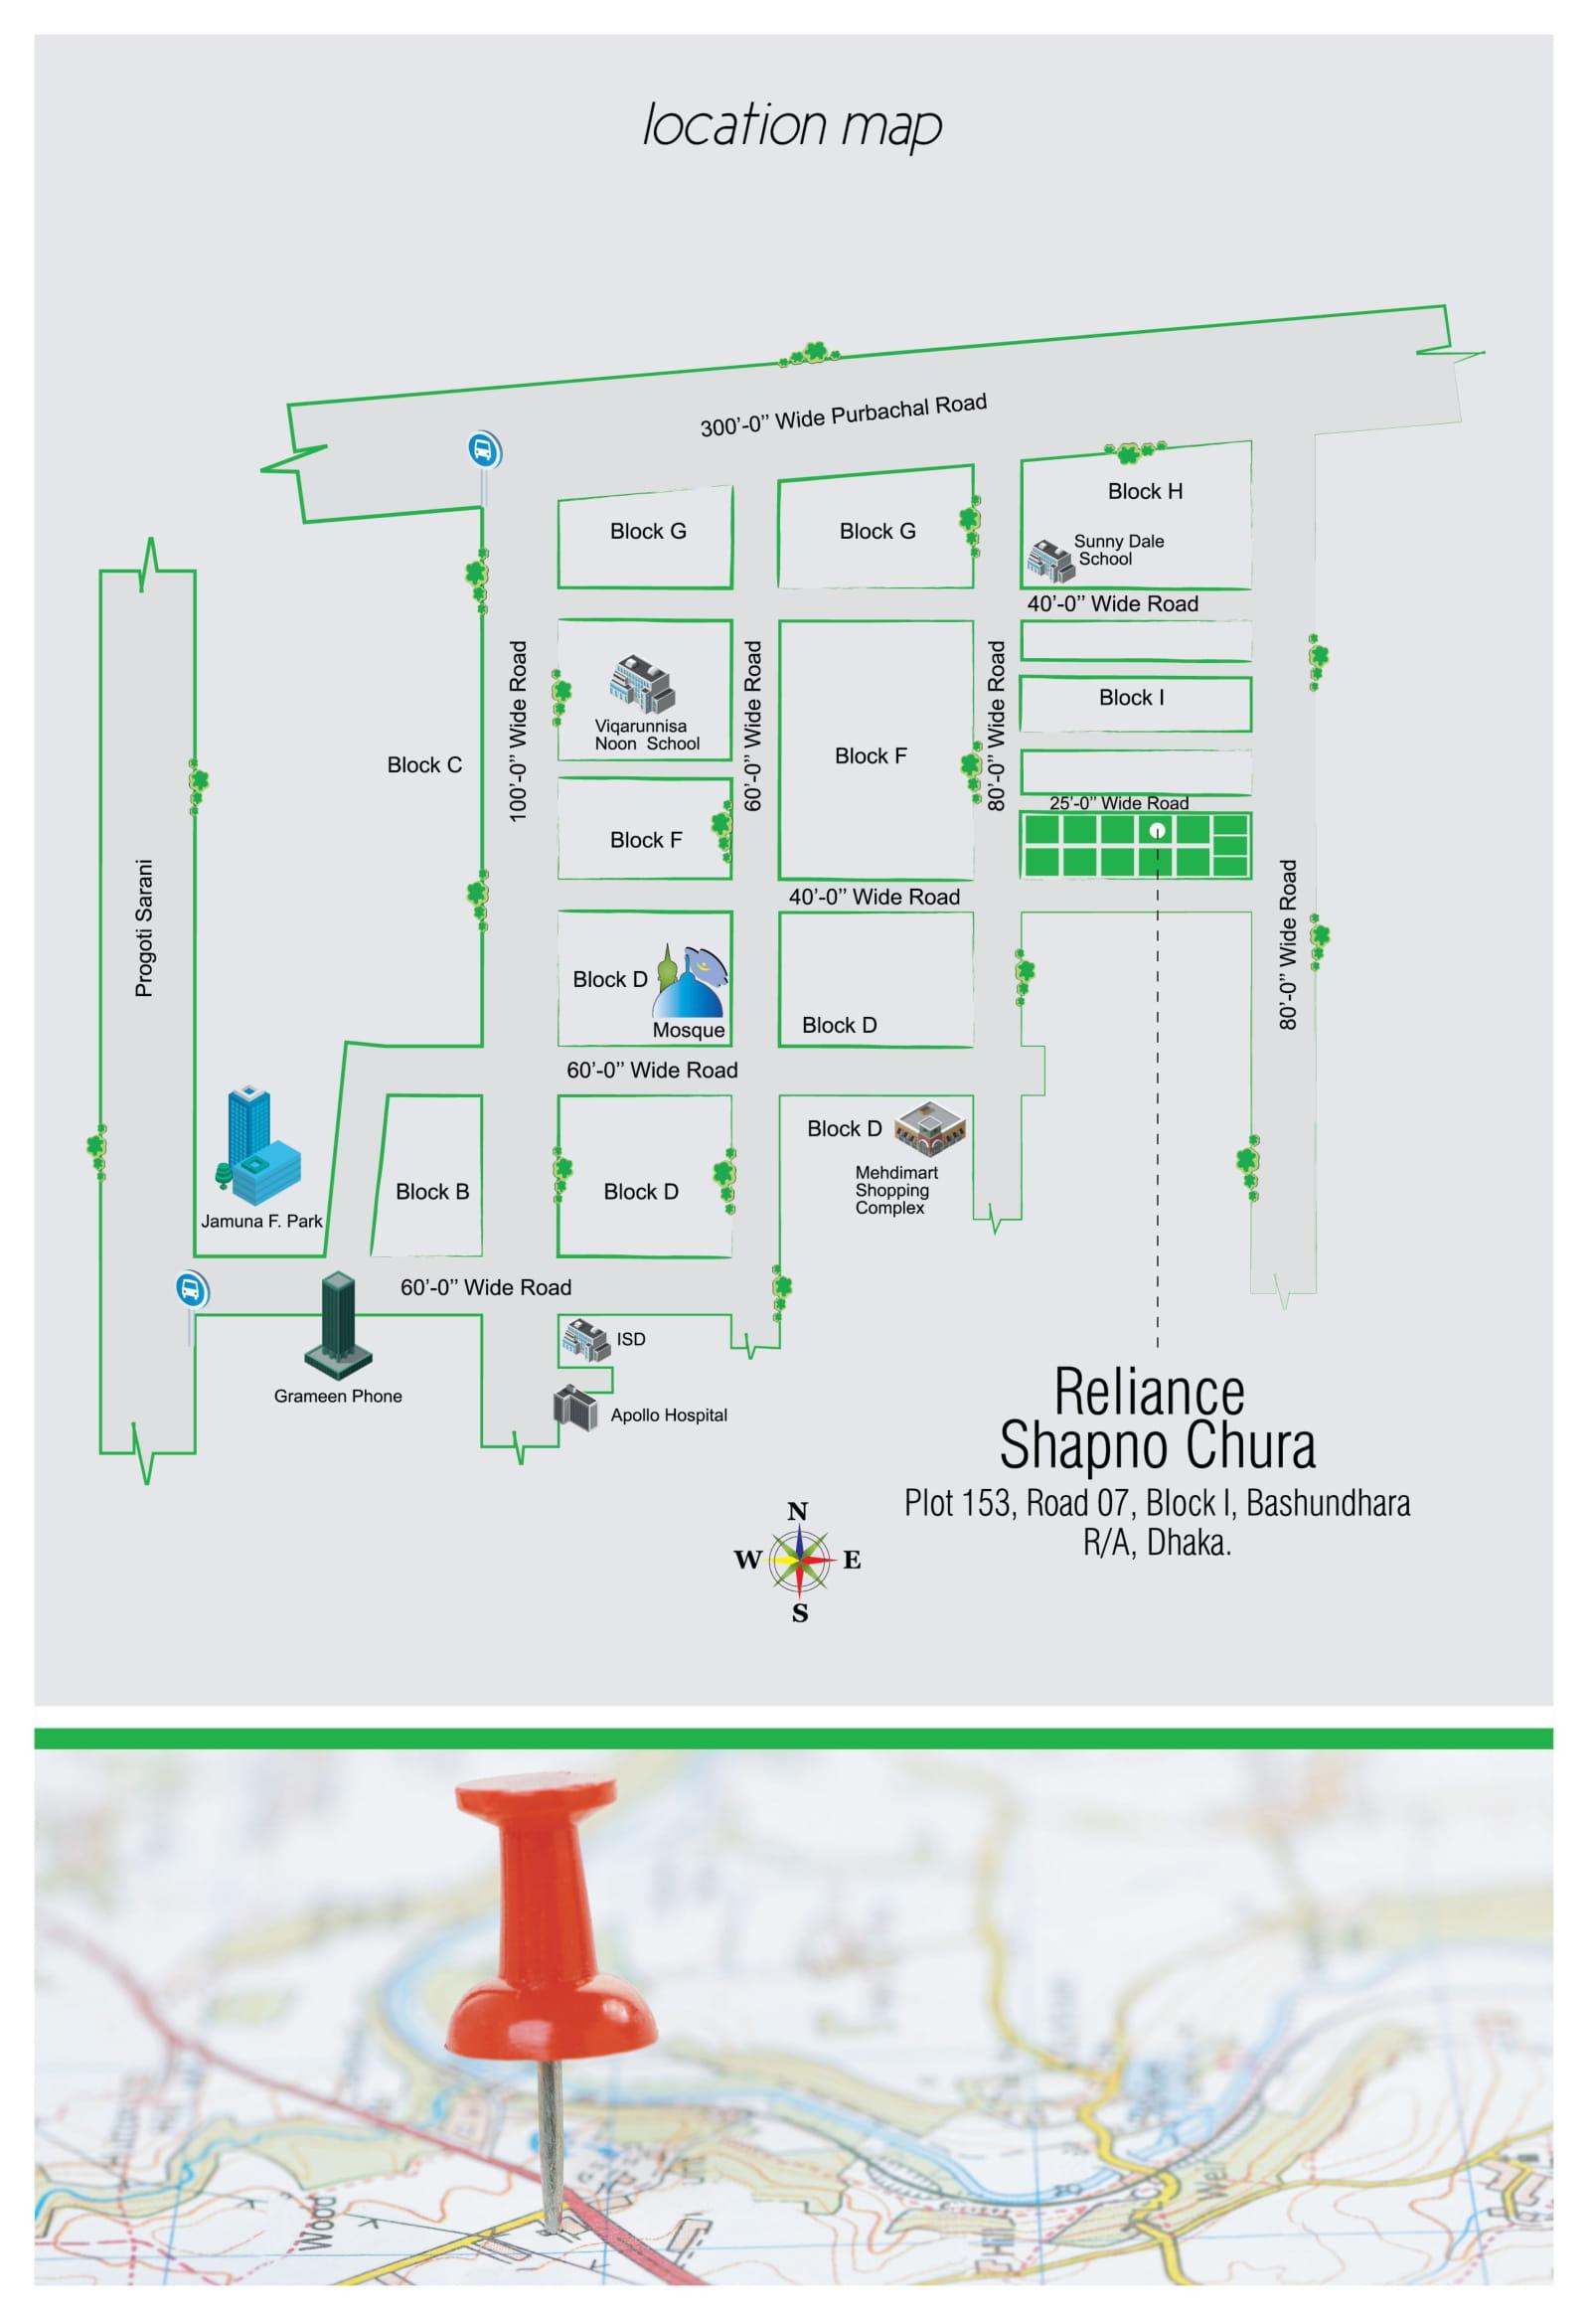 Reliance Shopna Chura